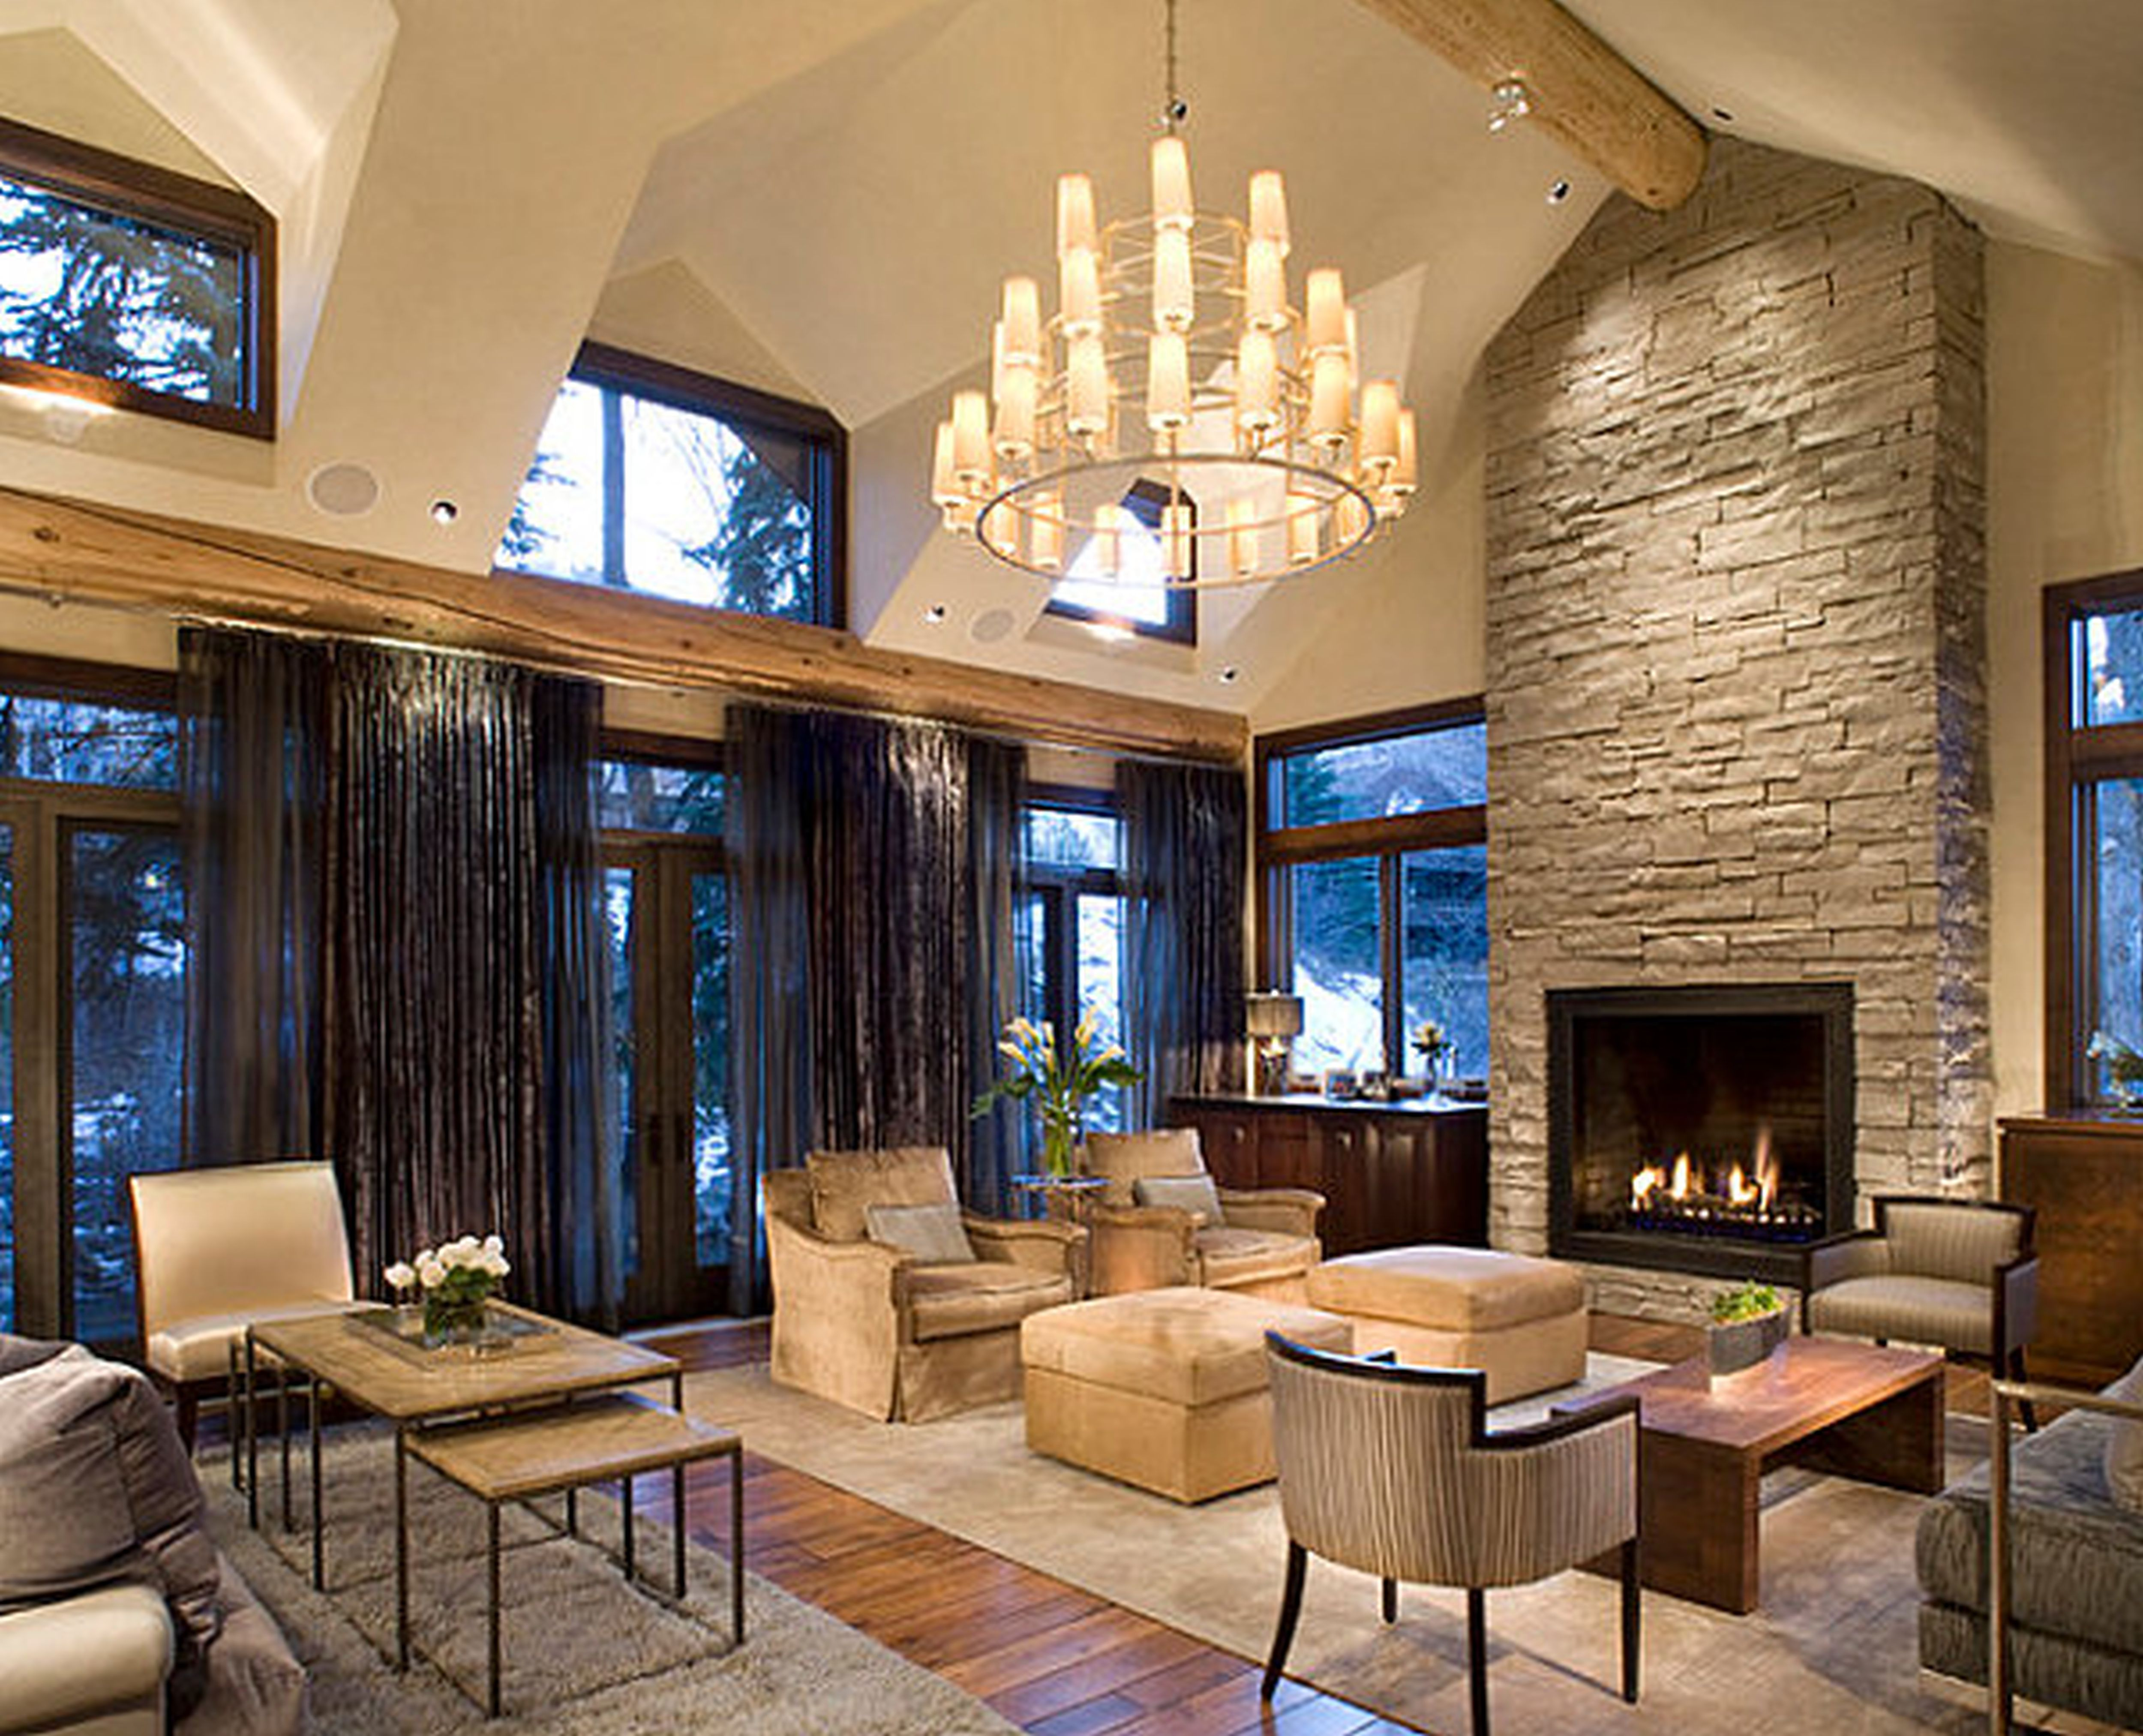 Rustic Home Design - HomesFeed